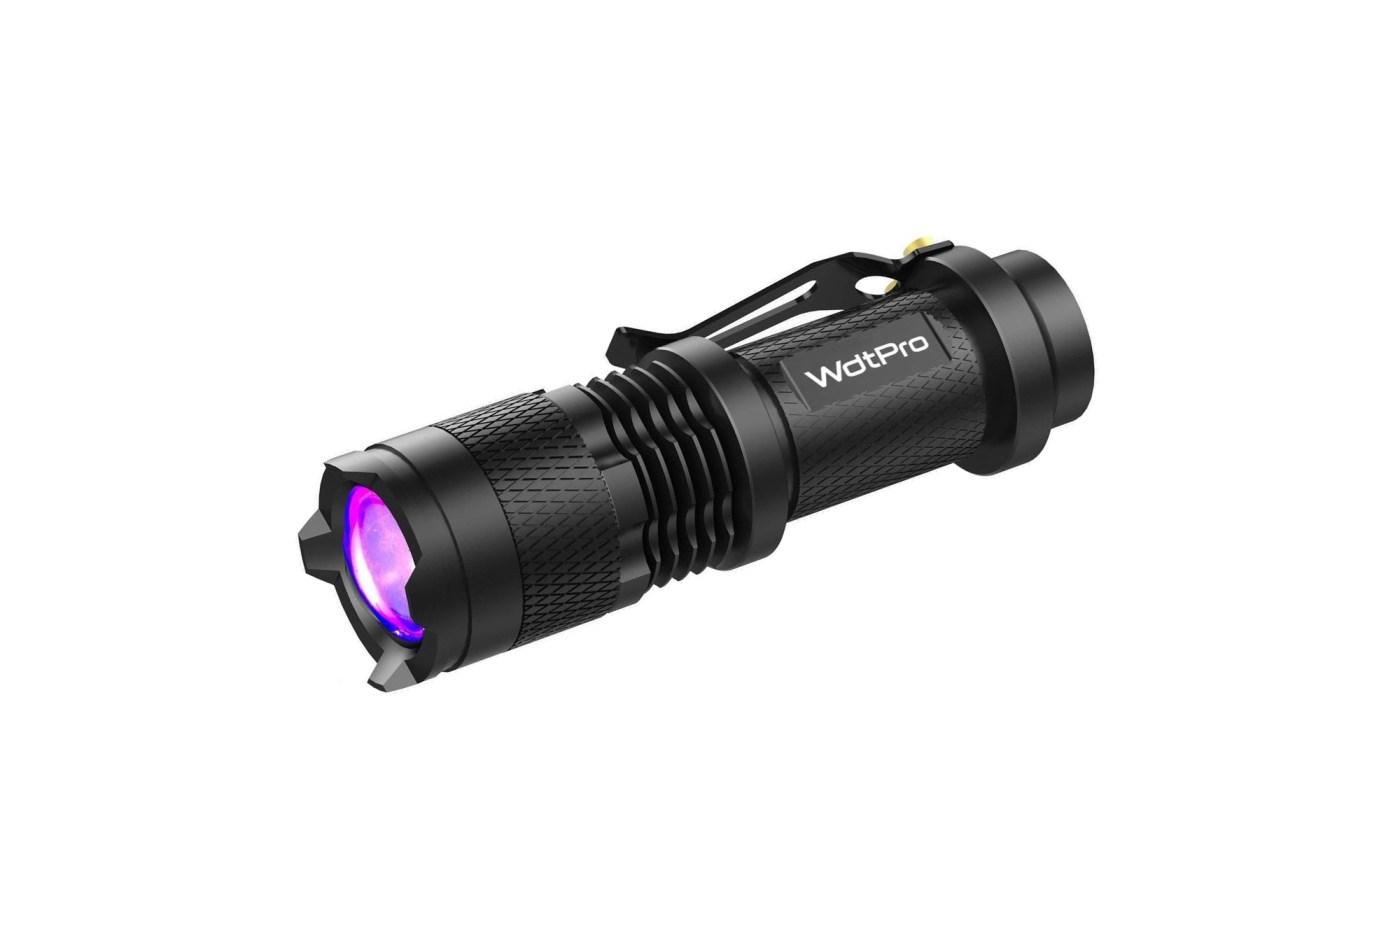 UV flashlight on Amazon